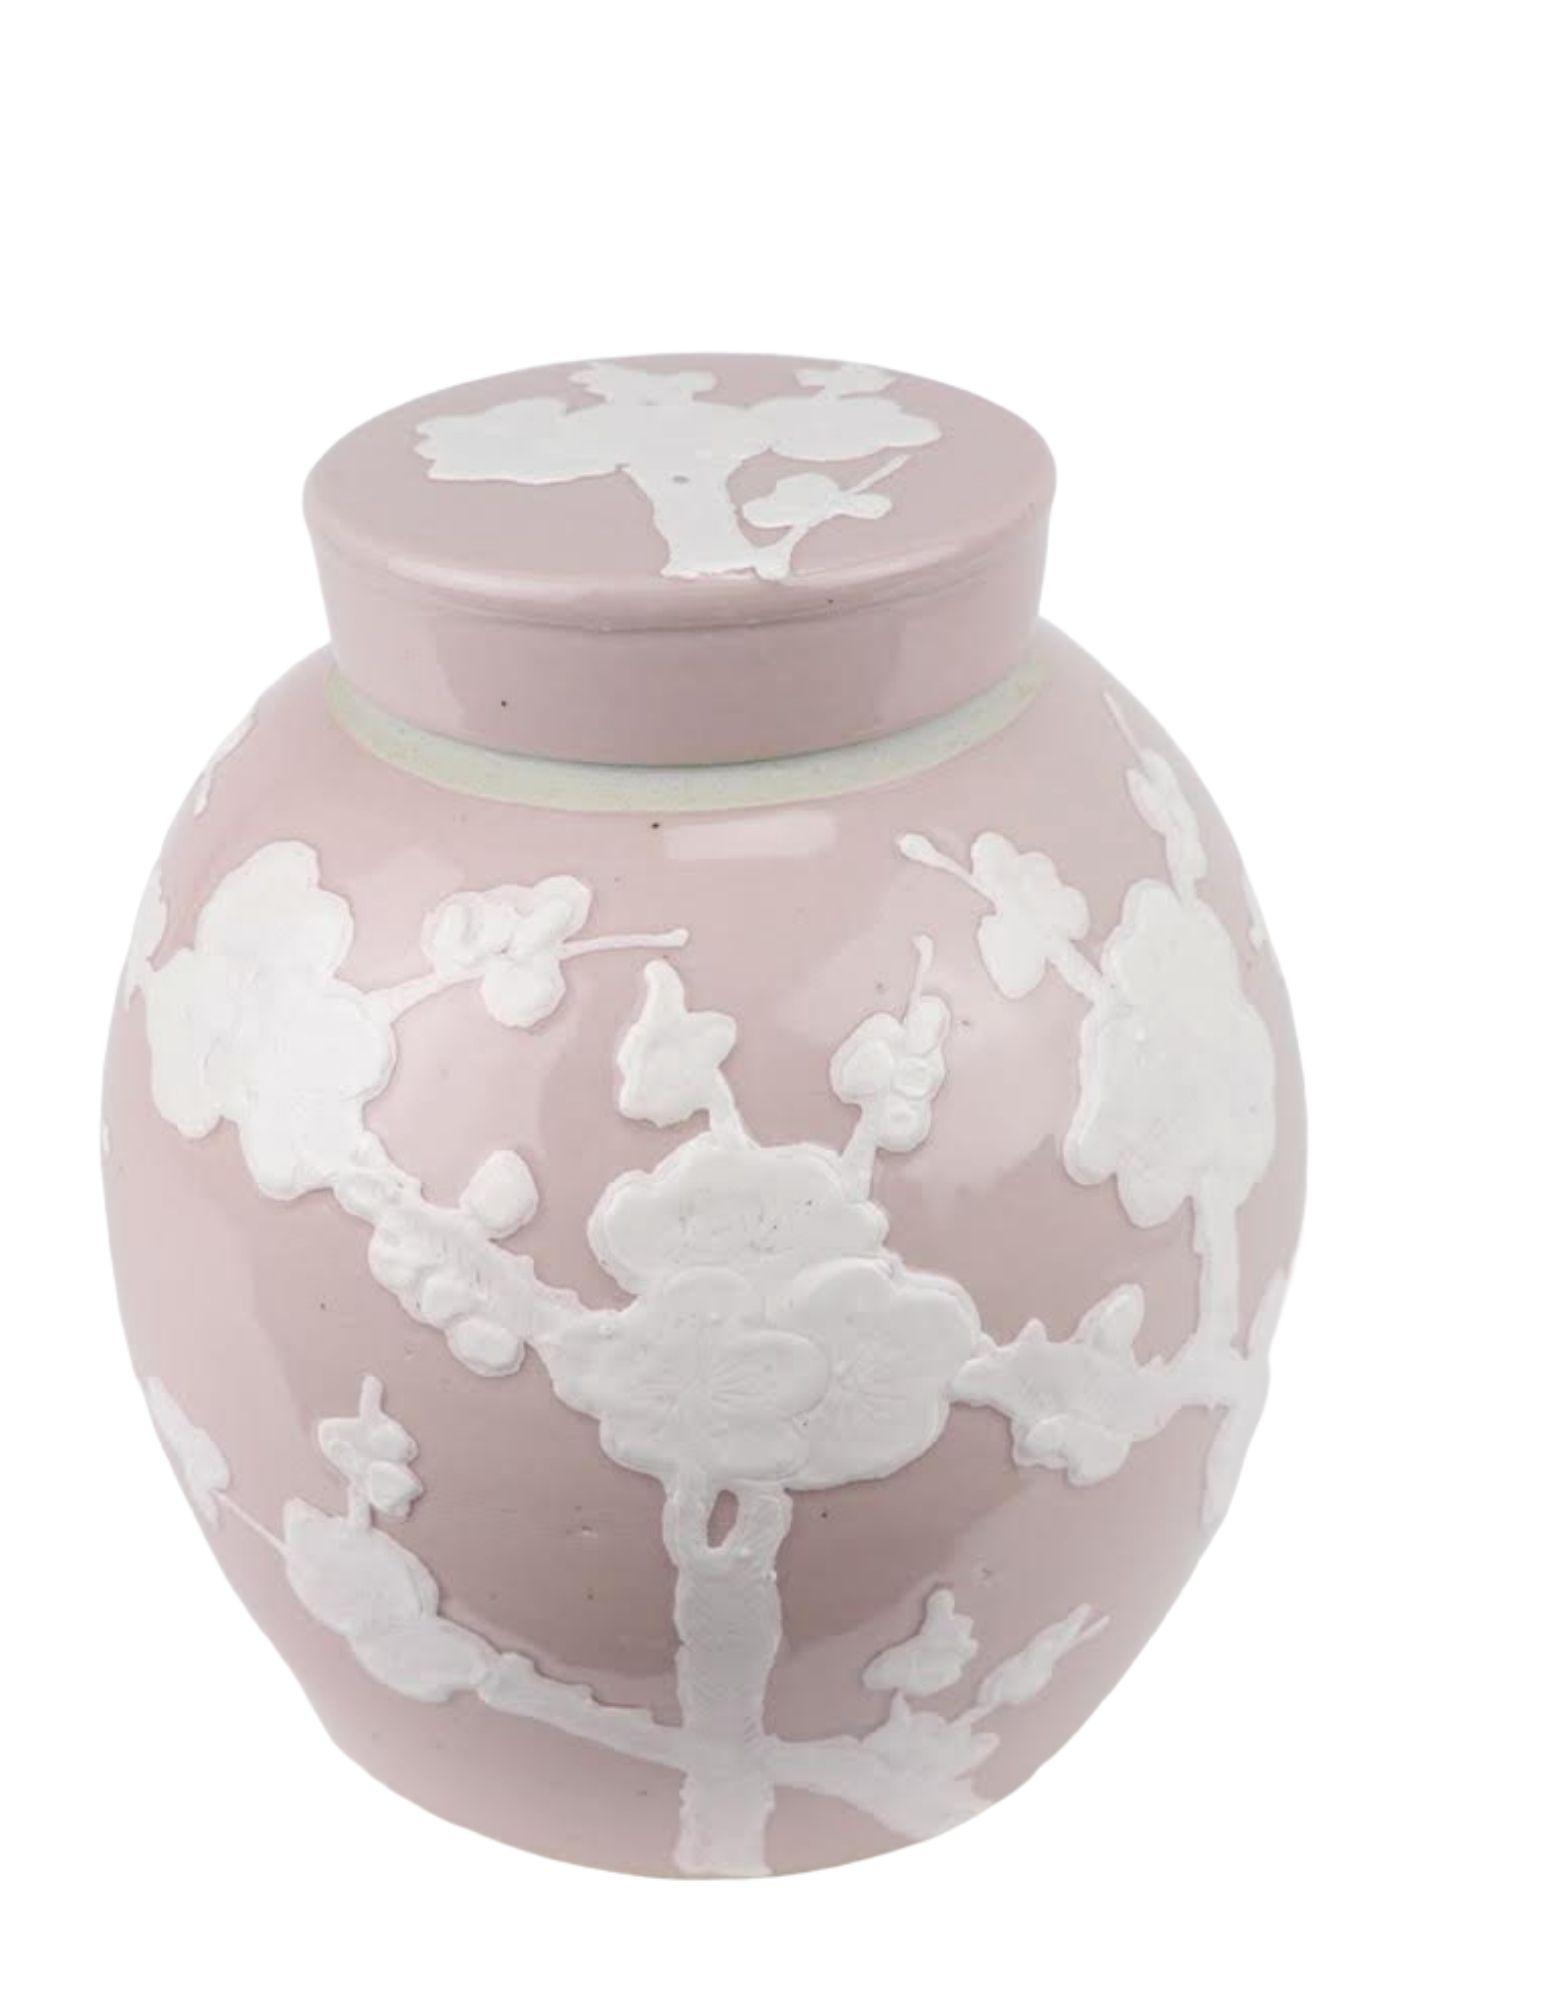 Incredible new flat top pastel ginger jar in pale pink